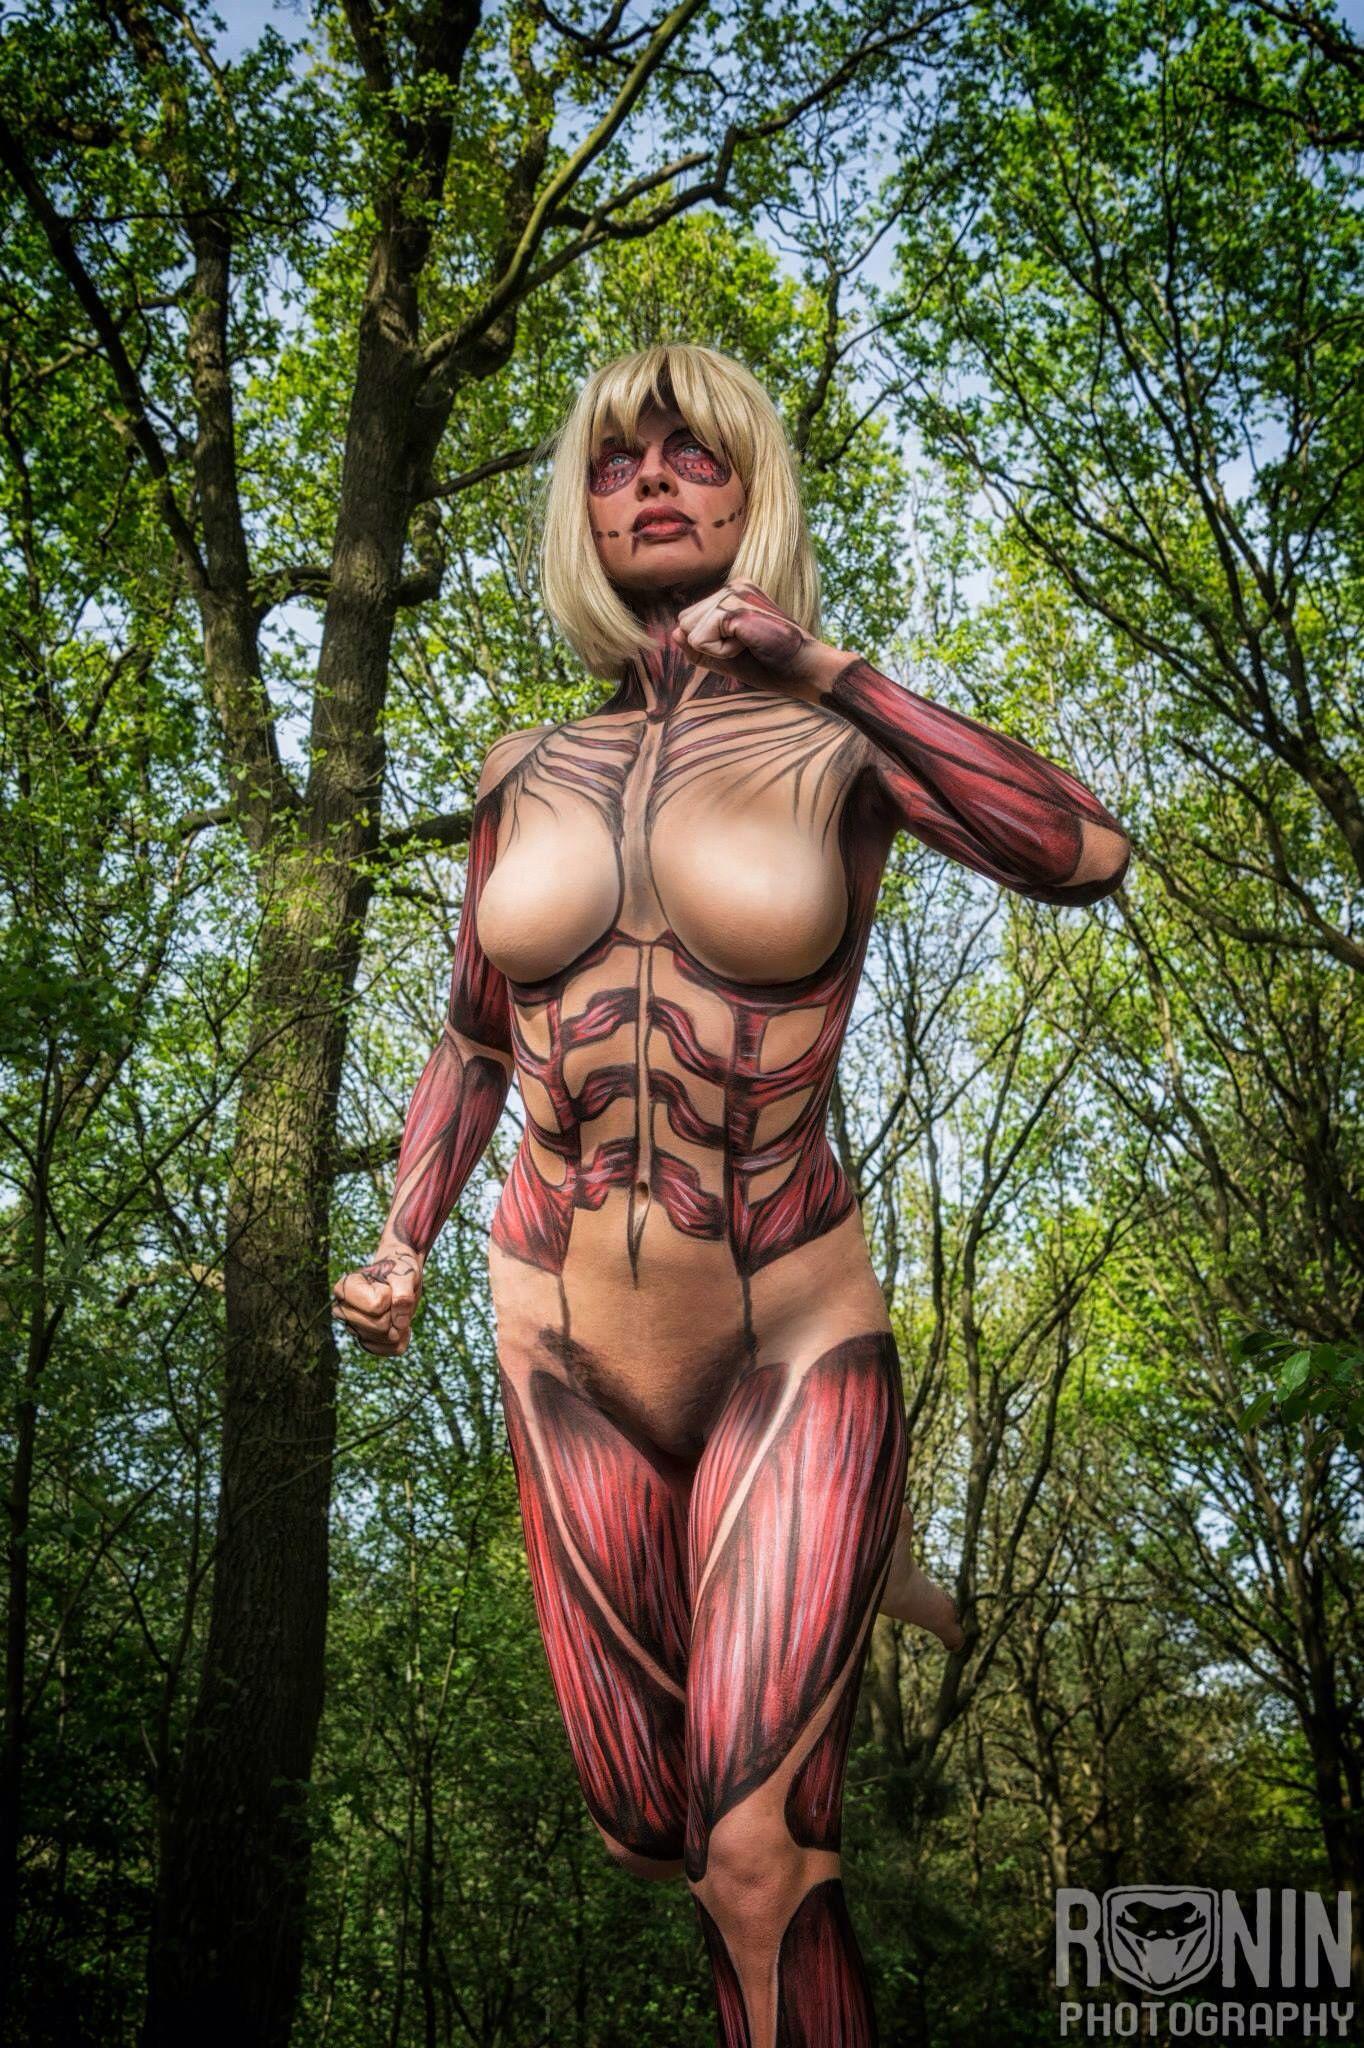 Female Titan full bodypaint model Jasmine Suzanna photo by Ronin